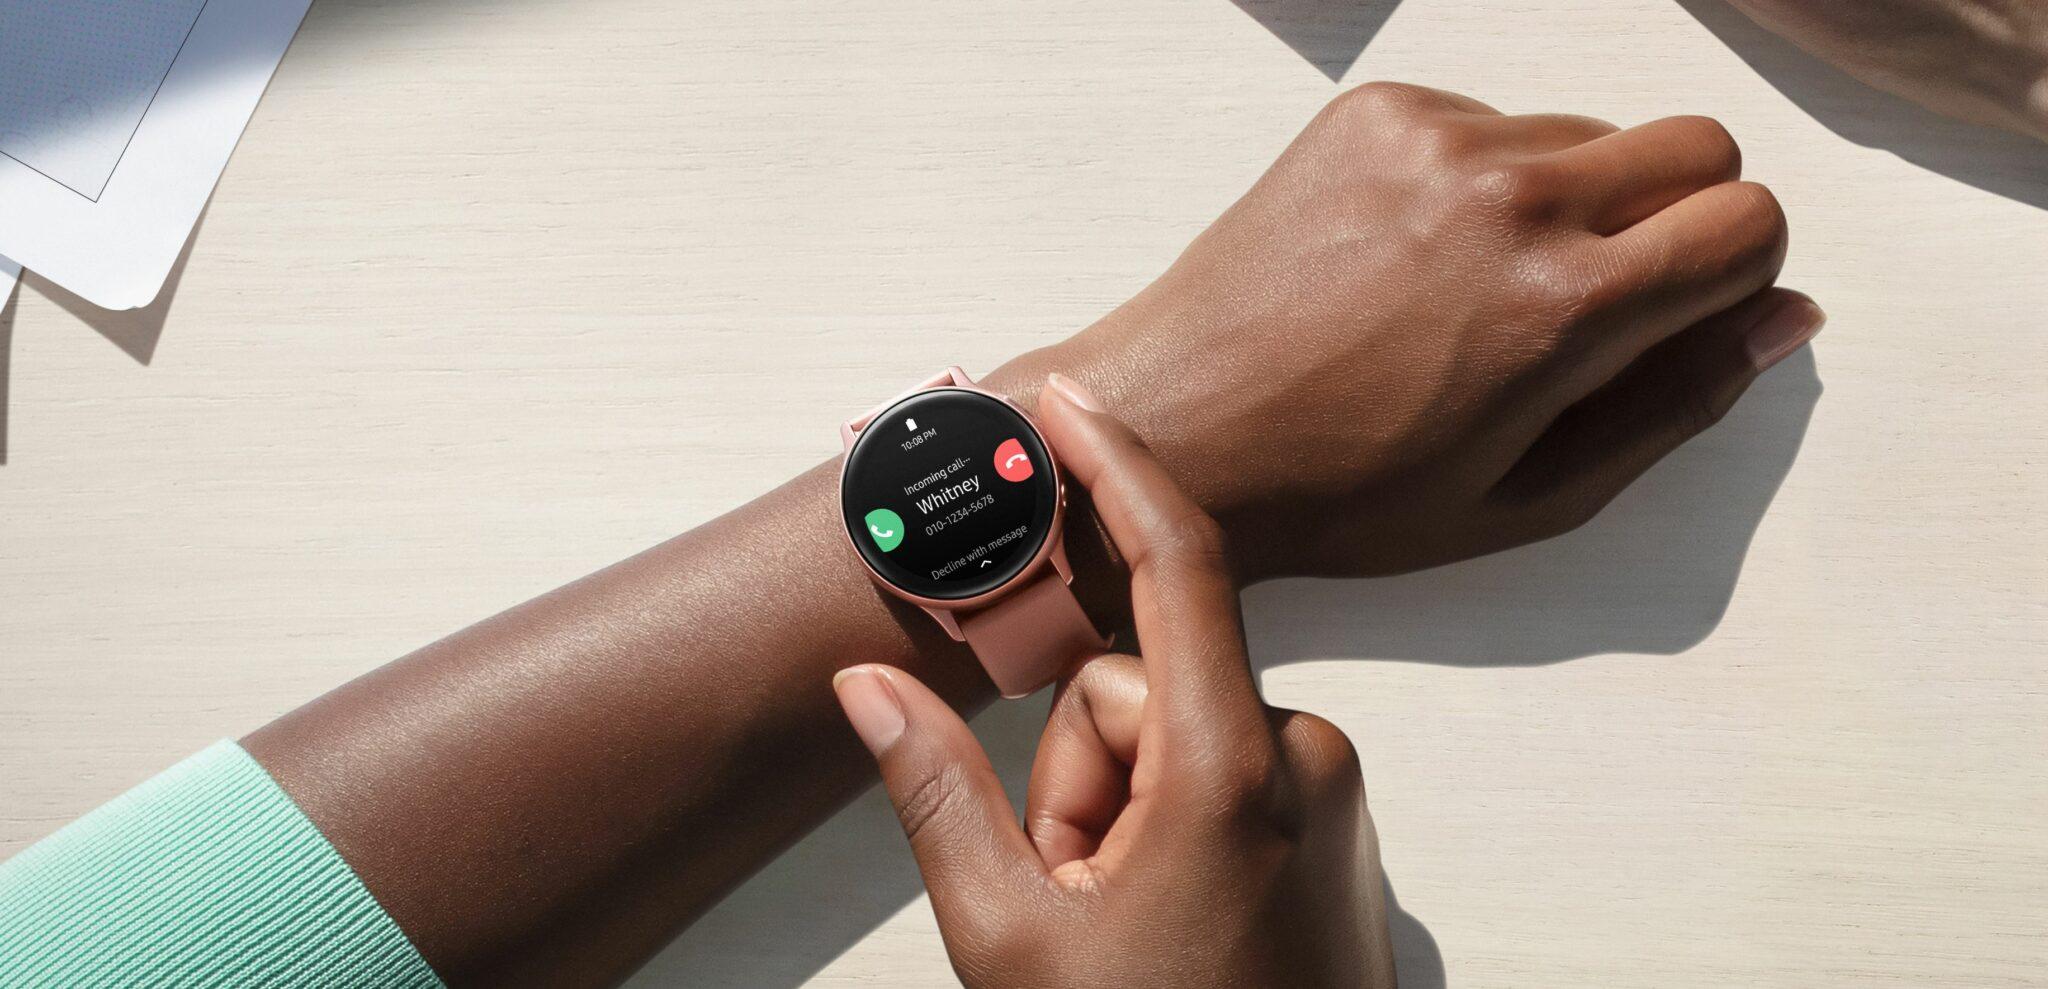 Galaxy Watch Active 2 wrist 2